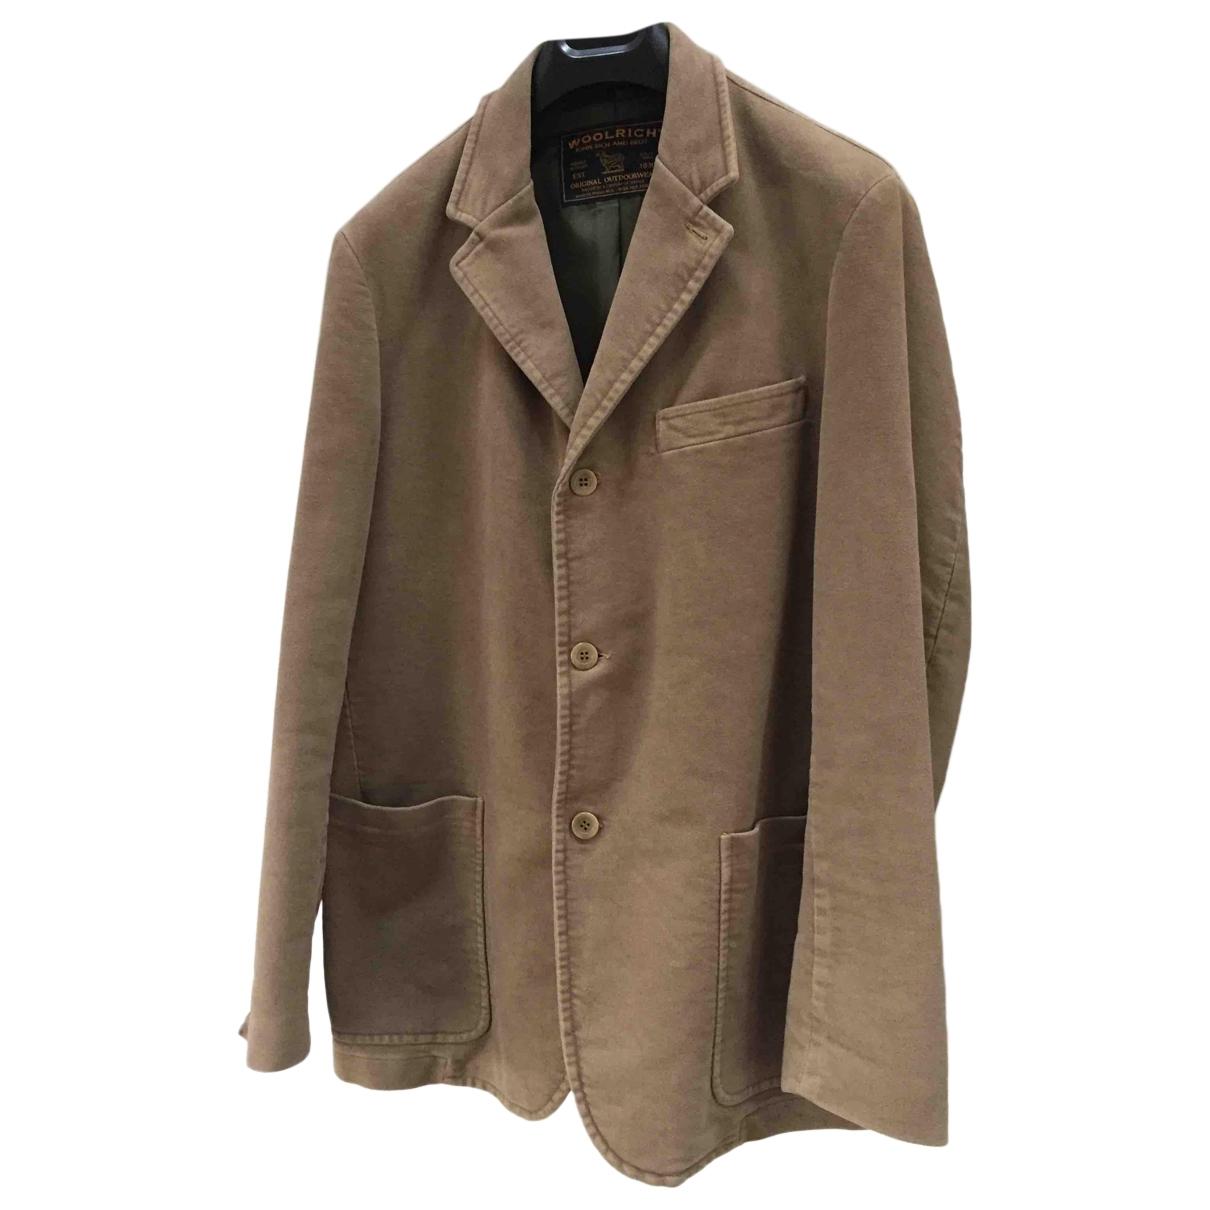 Woolrich \N Beige Cotton jacket  for Men M International